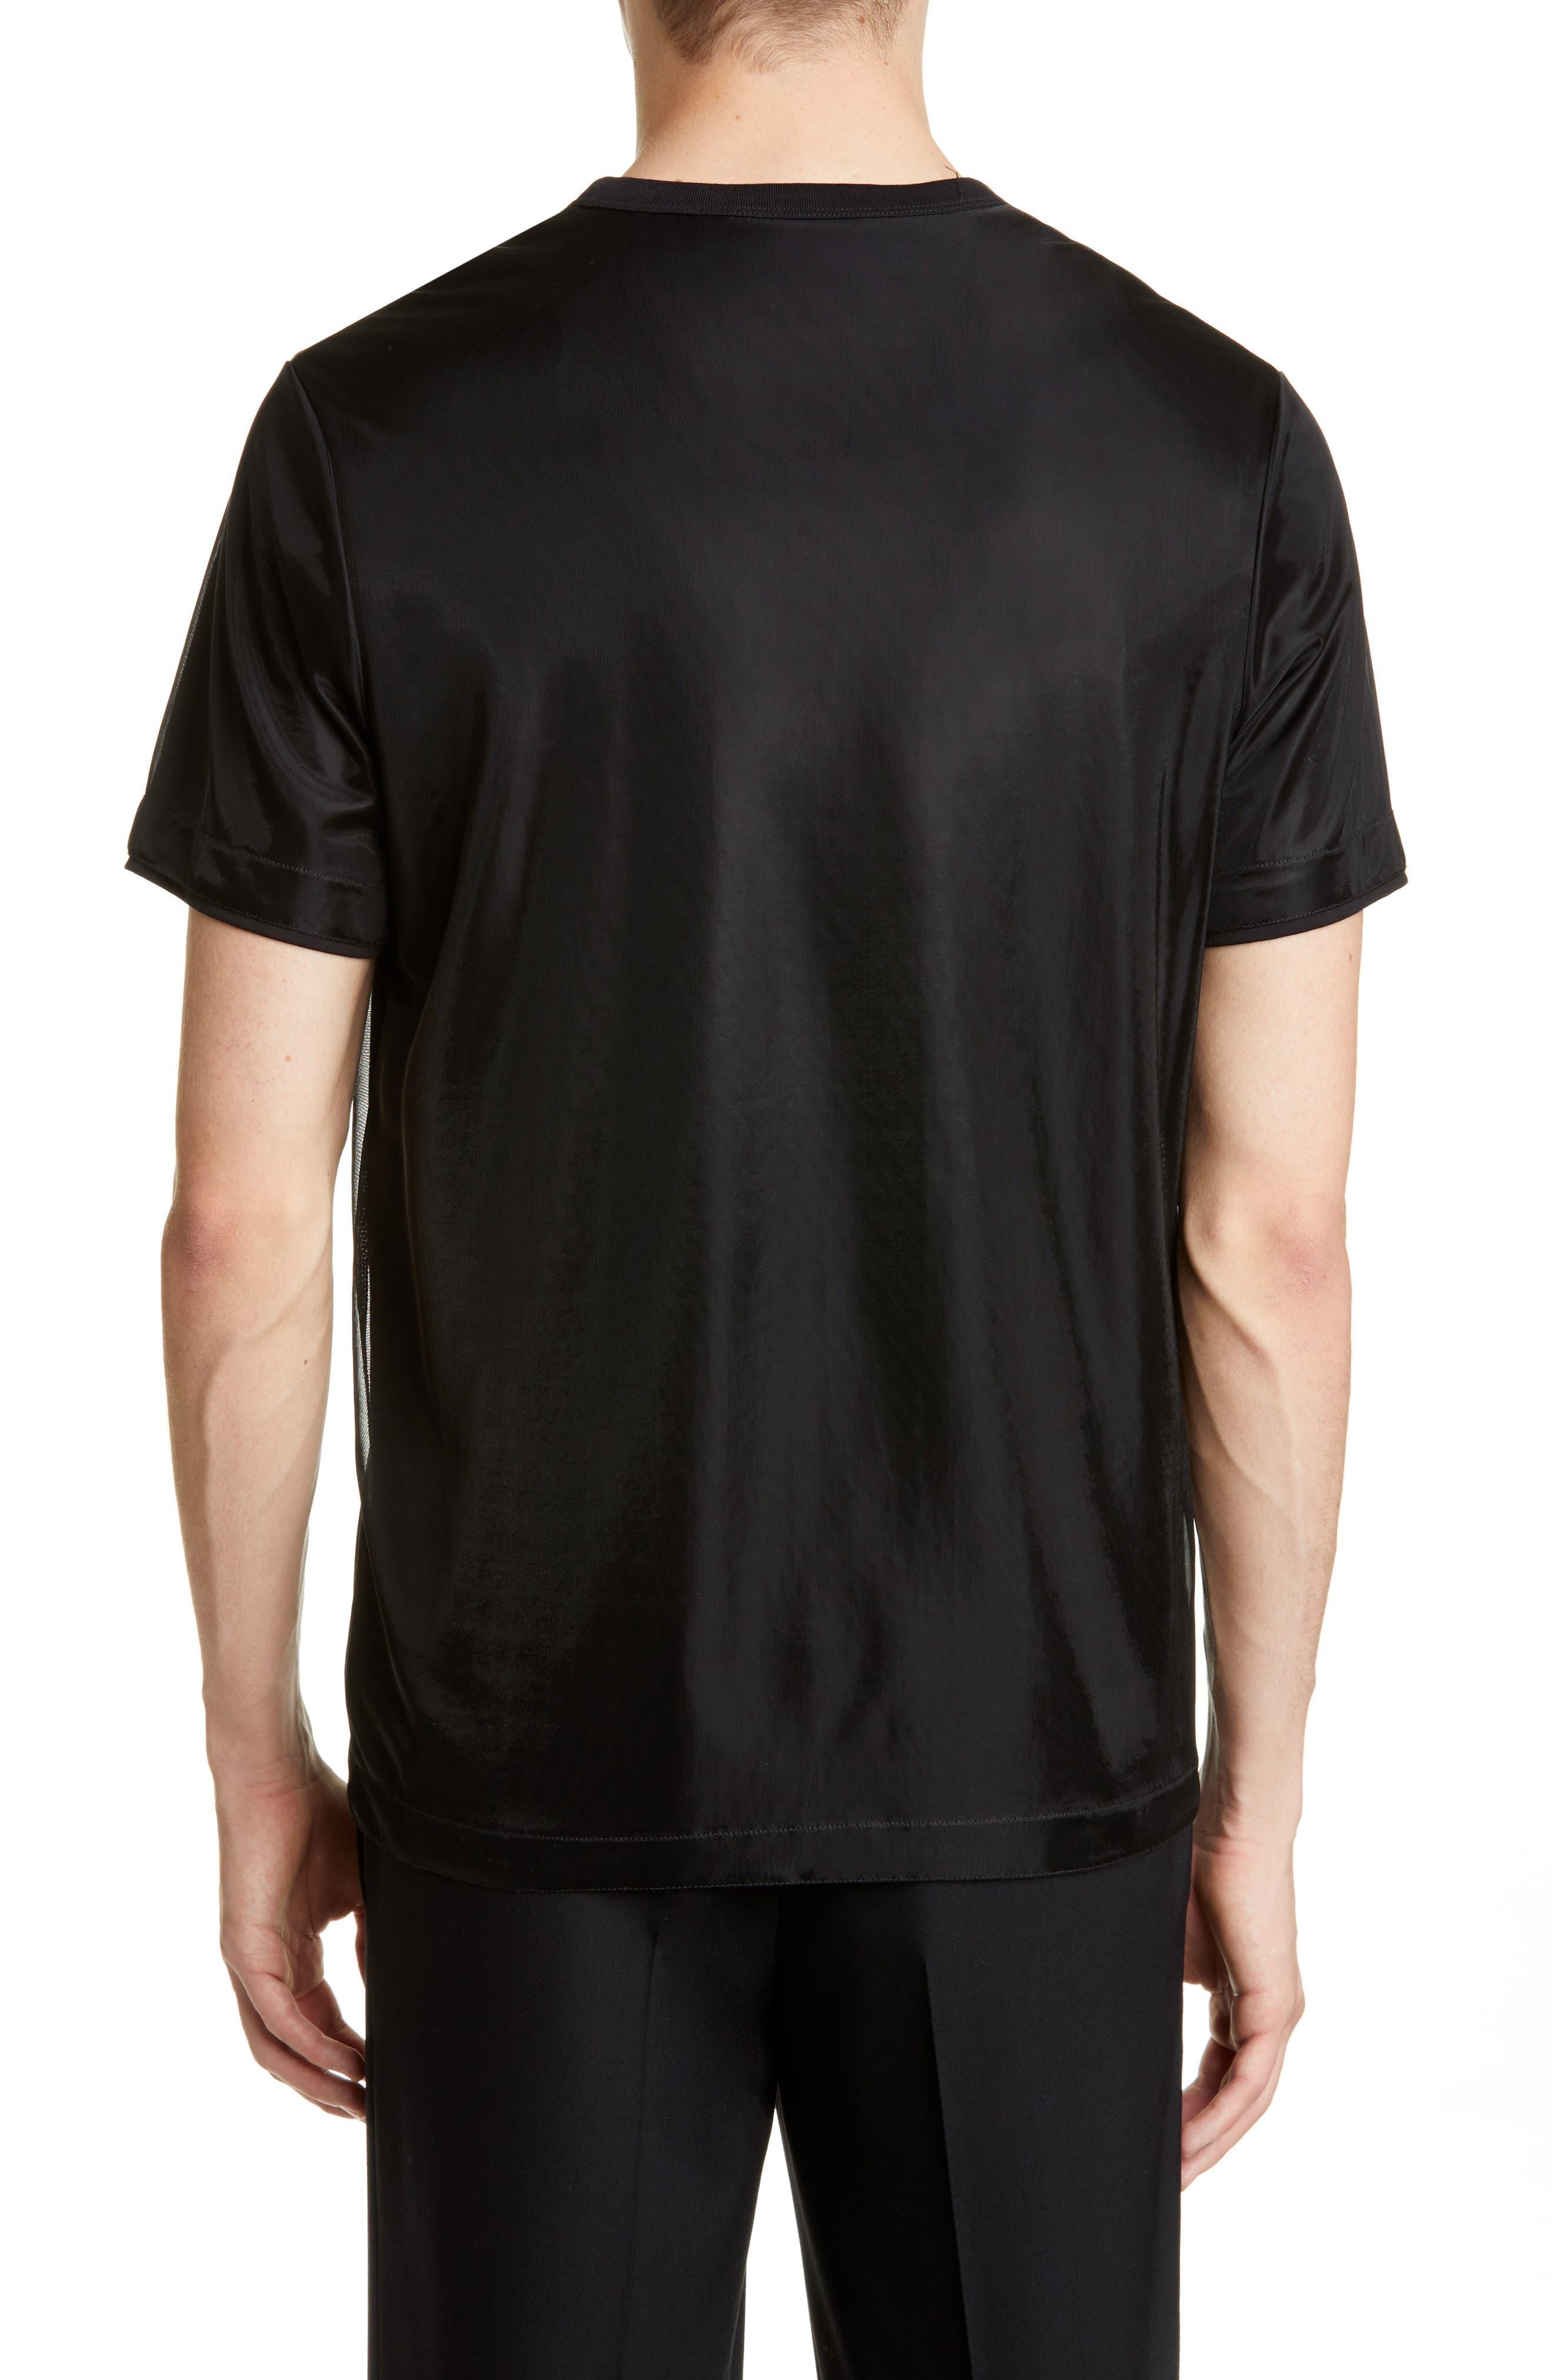 Helmut Lang Knits Double Knit T-Shirt